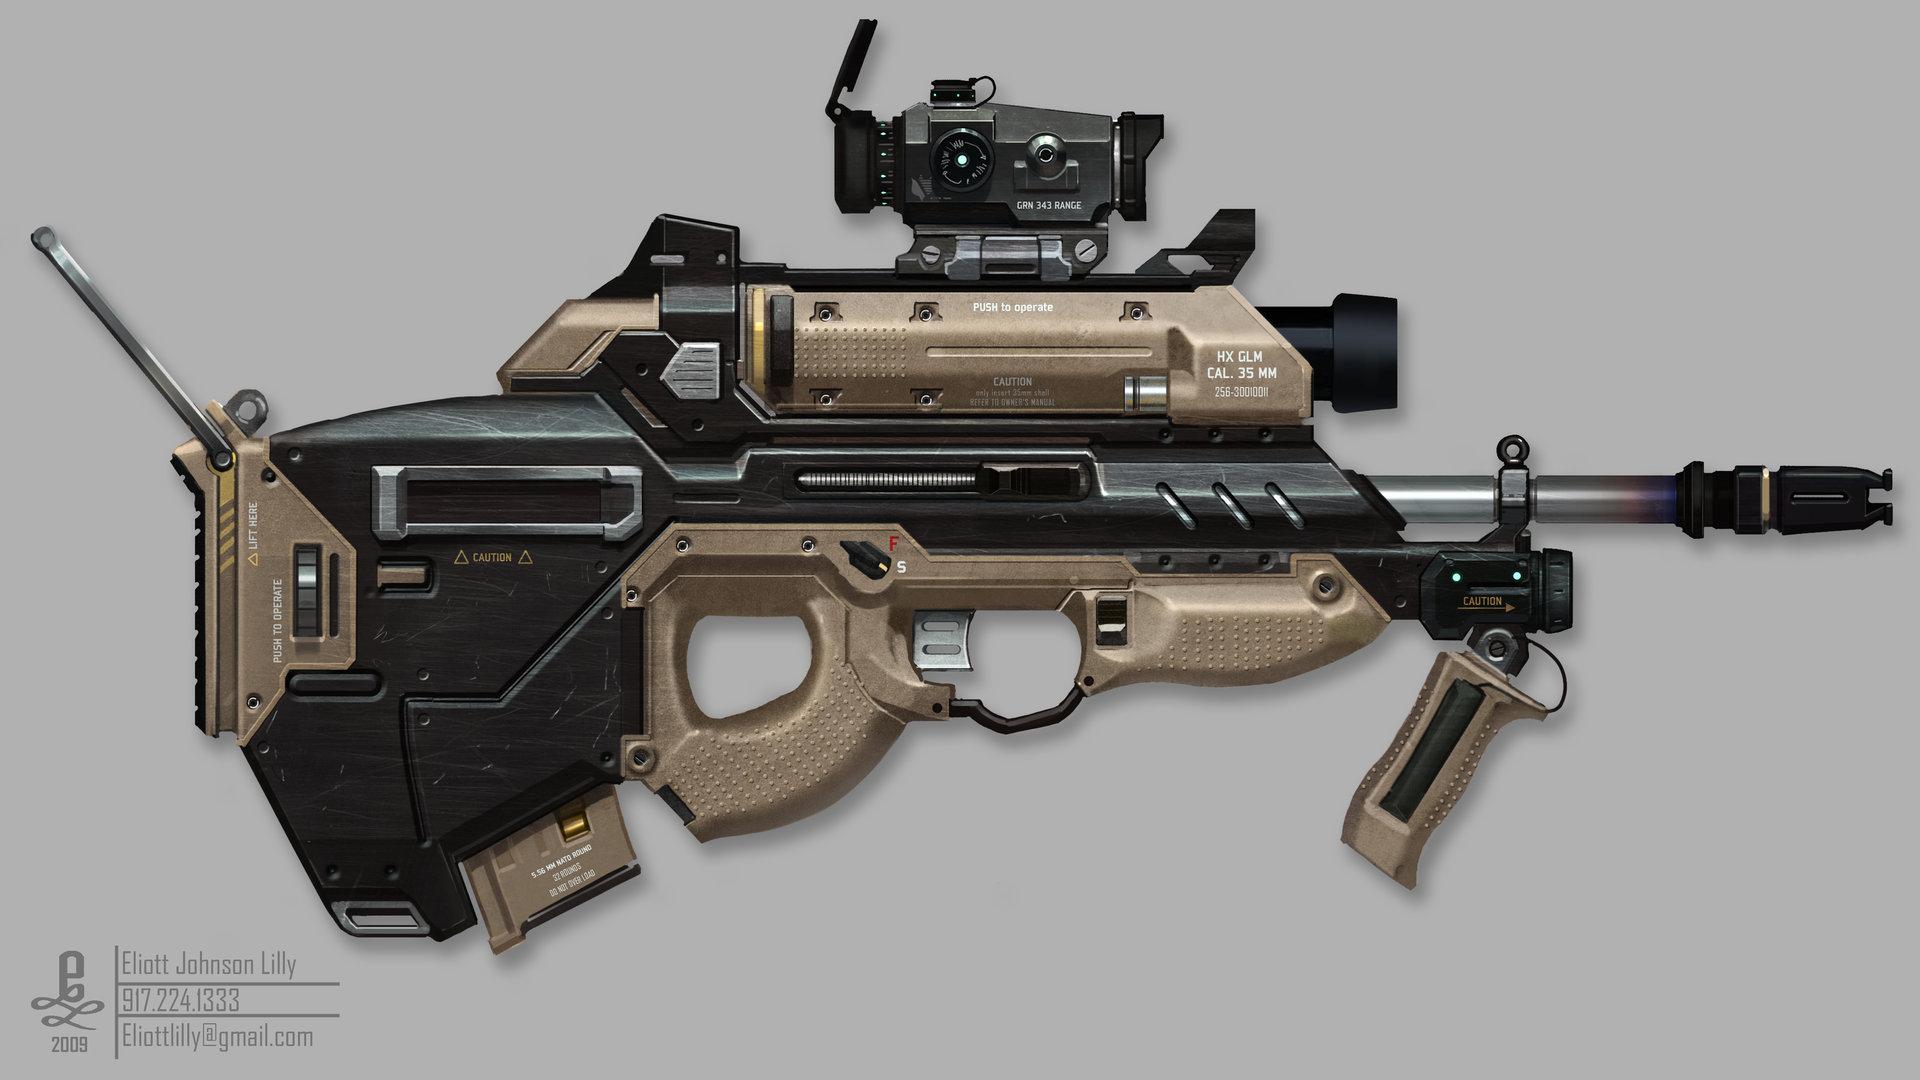 Eliott lilly big gun